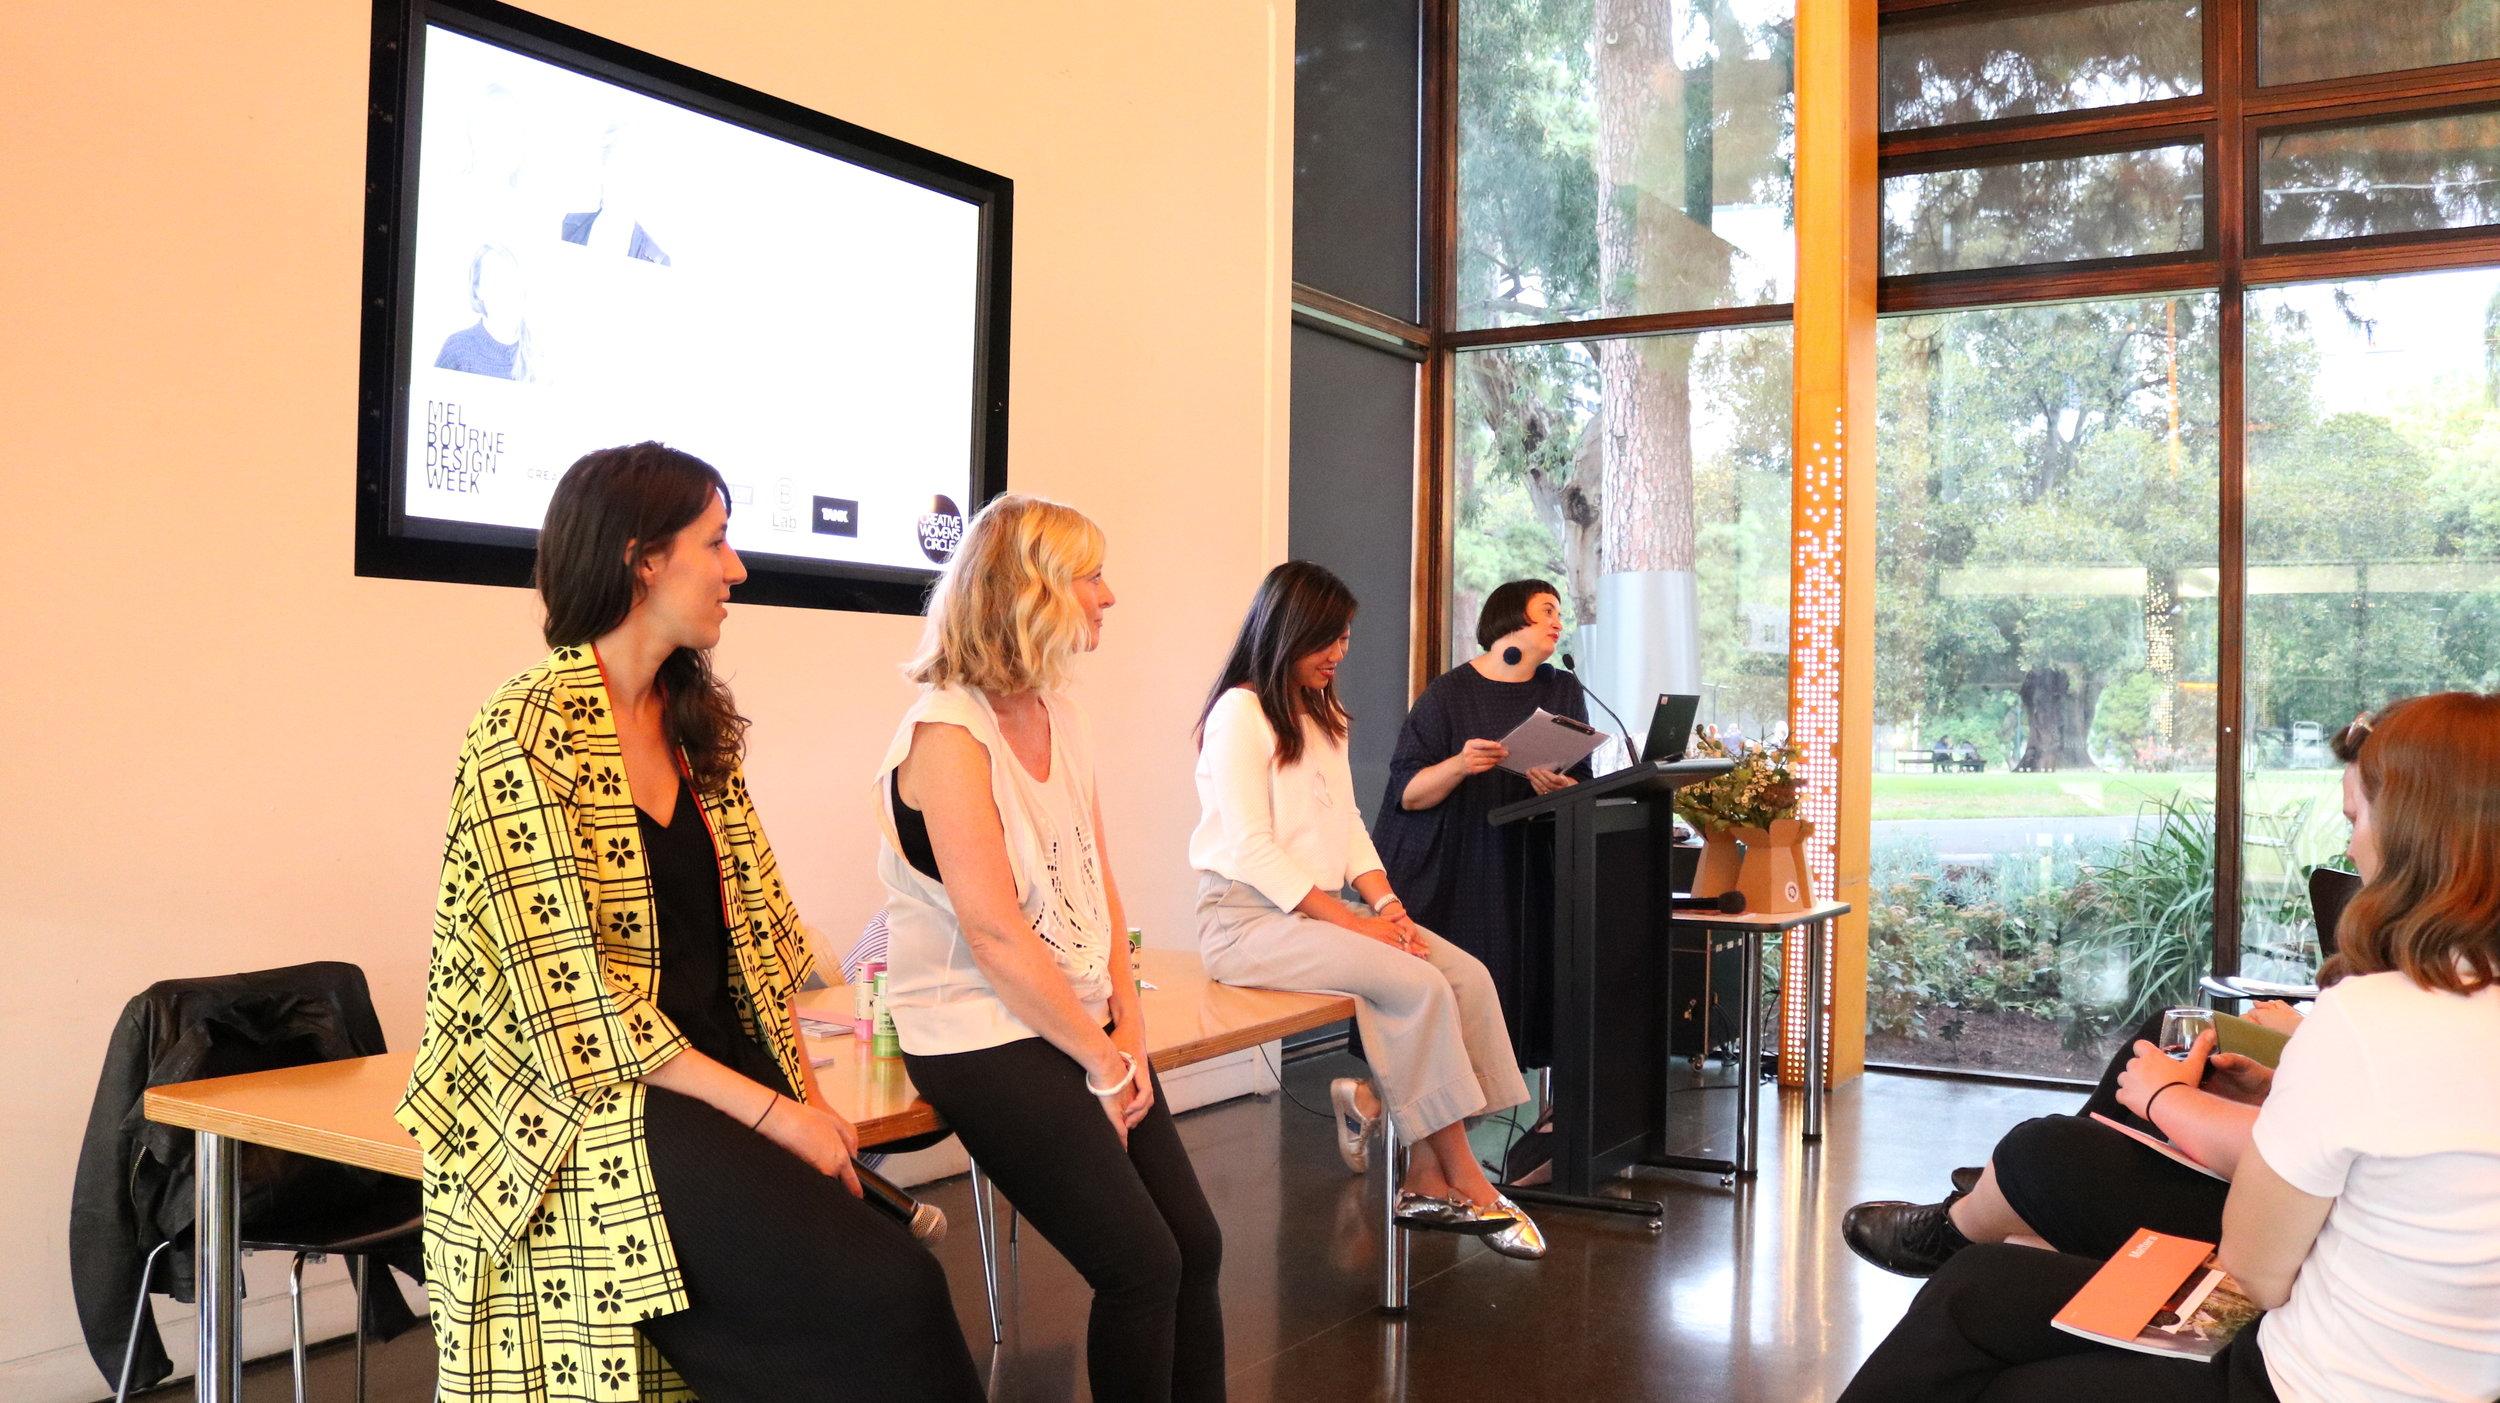 L - R: Roz Campbell (Tsuno), Katrina Dea (Tank Creative), Mindy Leow (B Lab), Netti Burke (CWC)